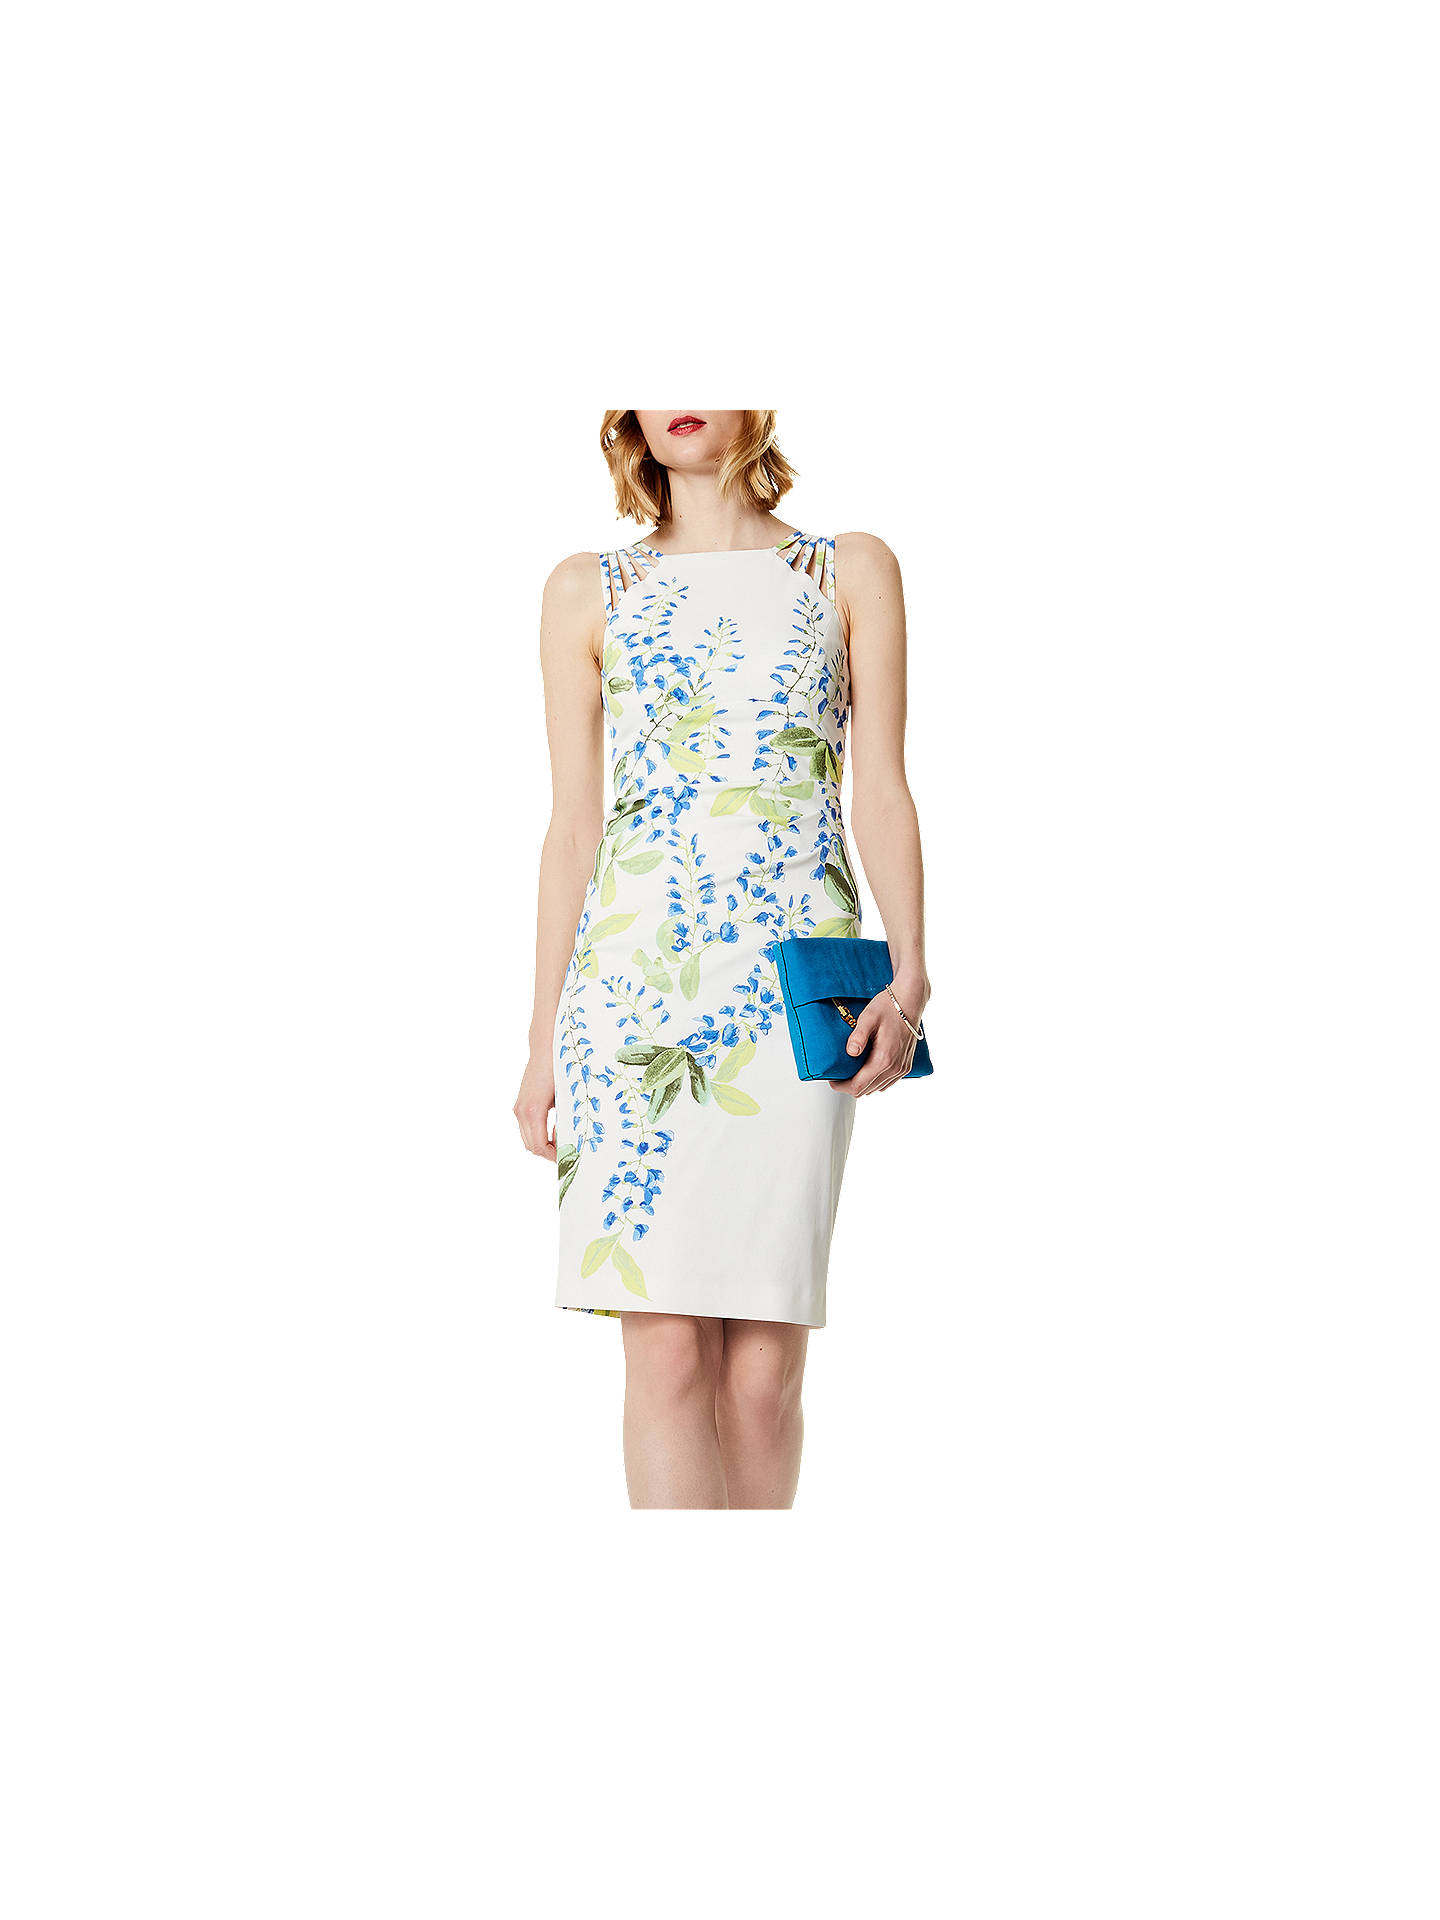 e2e2965dc2 ... Buy Karen Millen Wisteria Print Dress